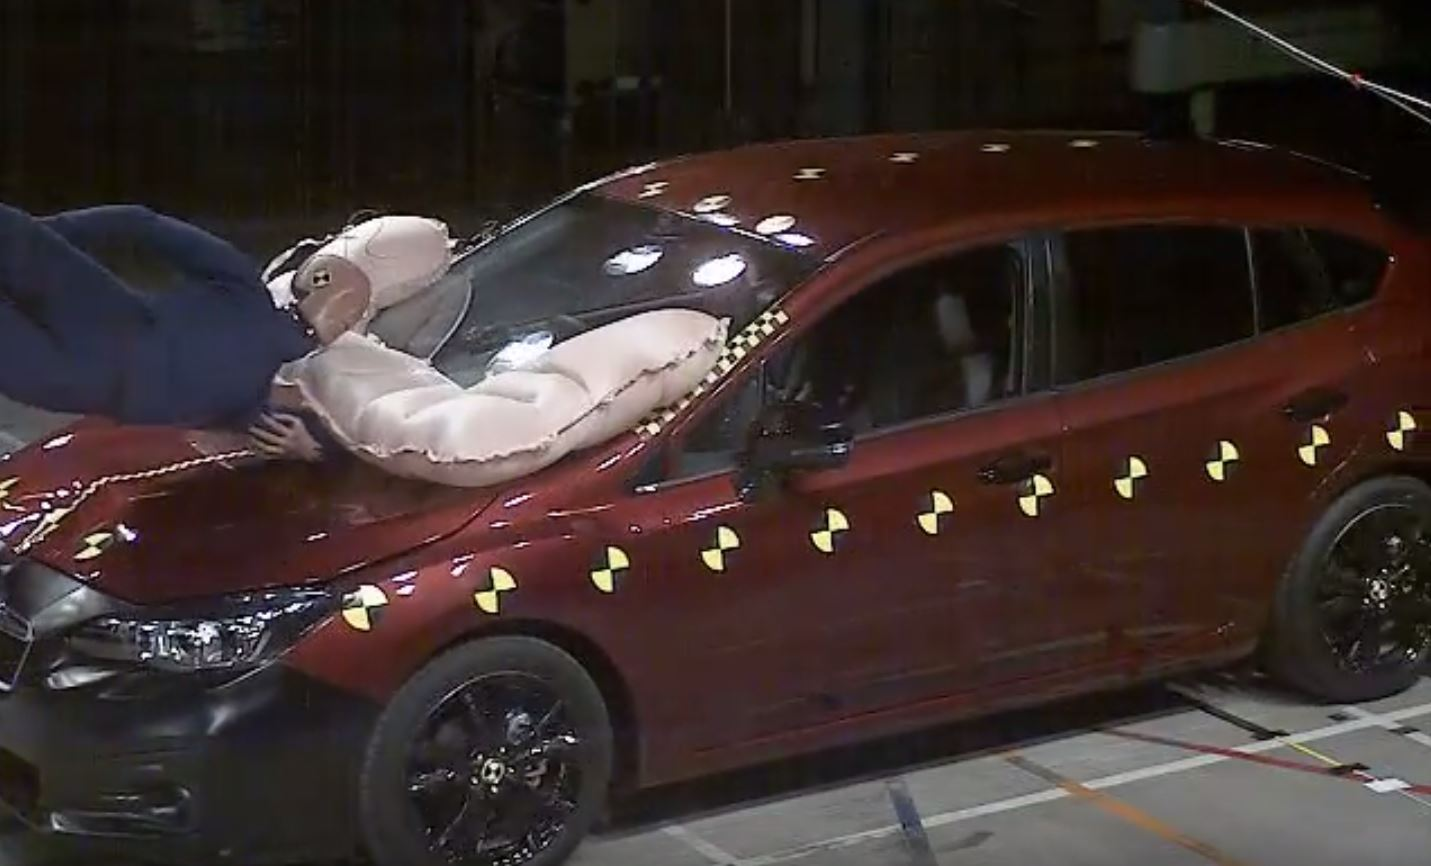 All New Subaru Impreza Has Standard Pedestrian Airbag